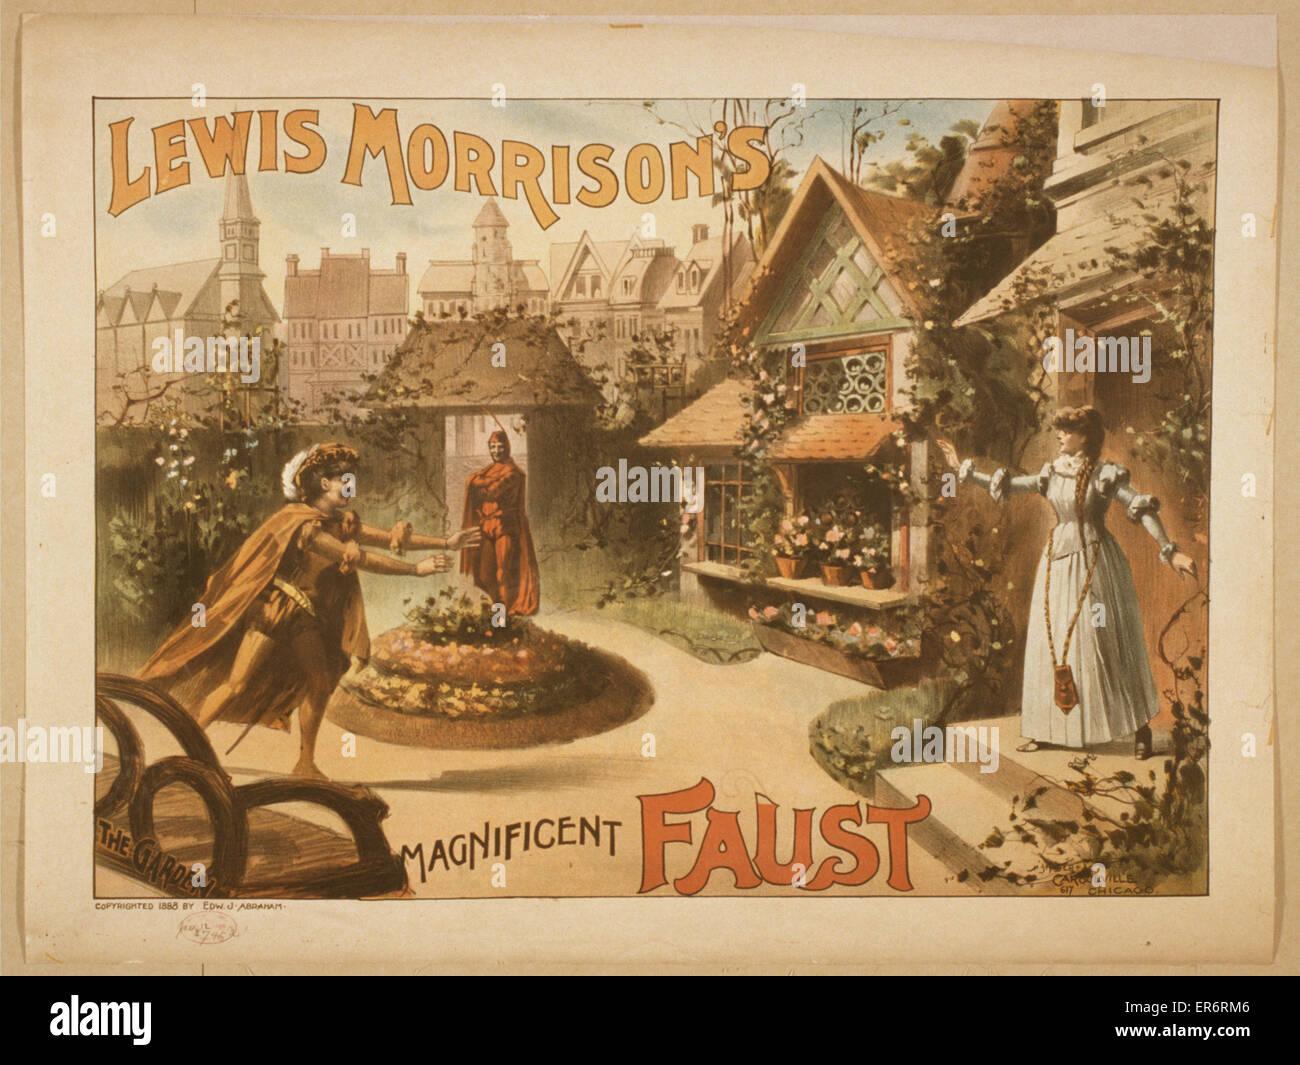 Lewis Morrison's magnificent Faust. Date c1888. - Stock Image